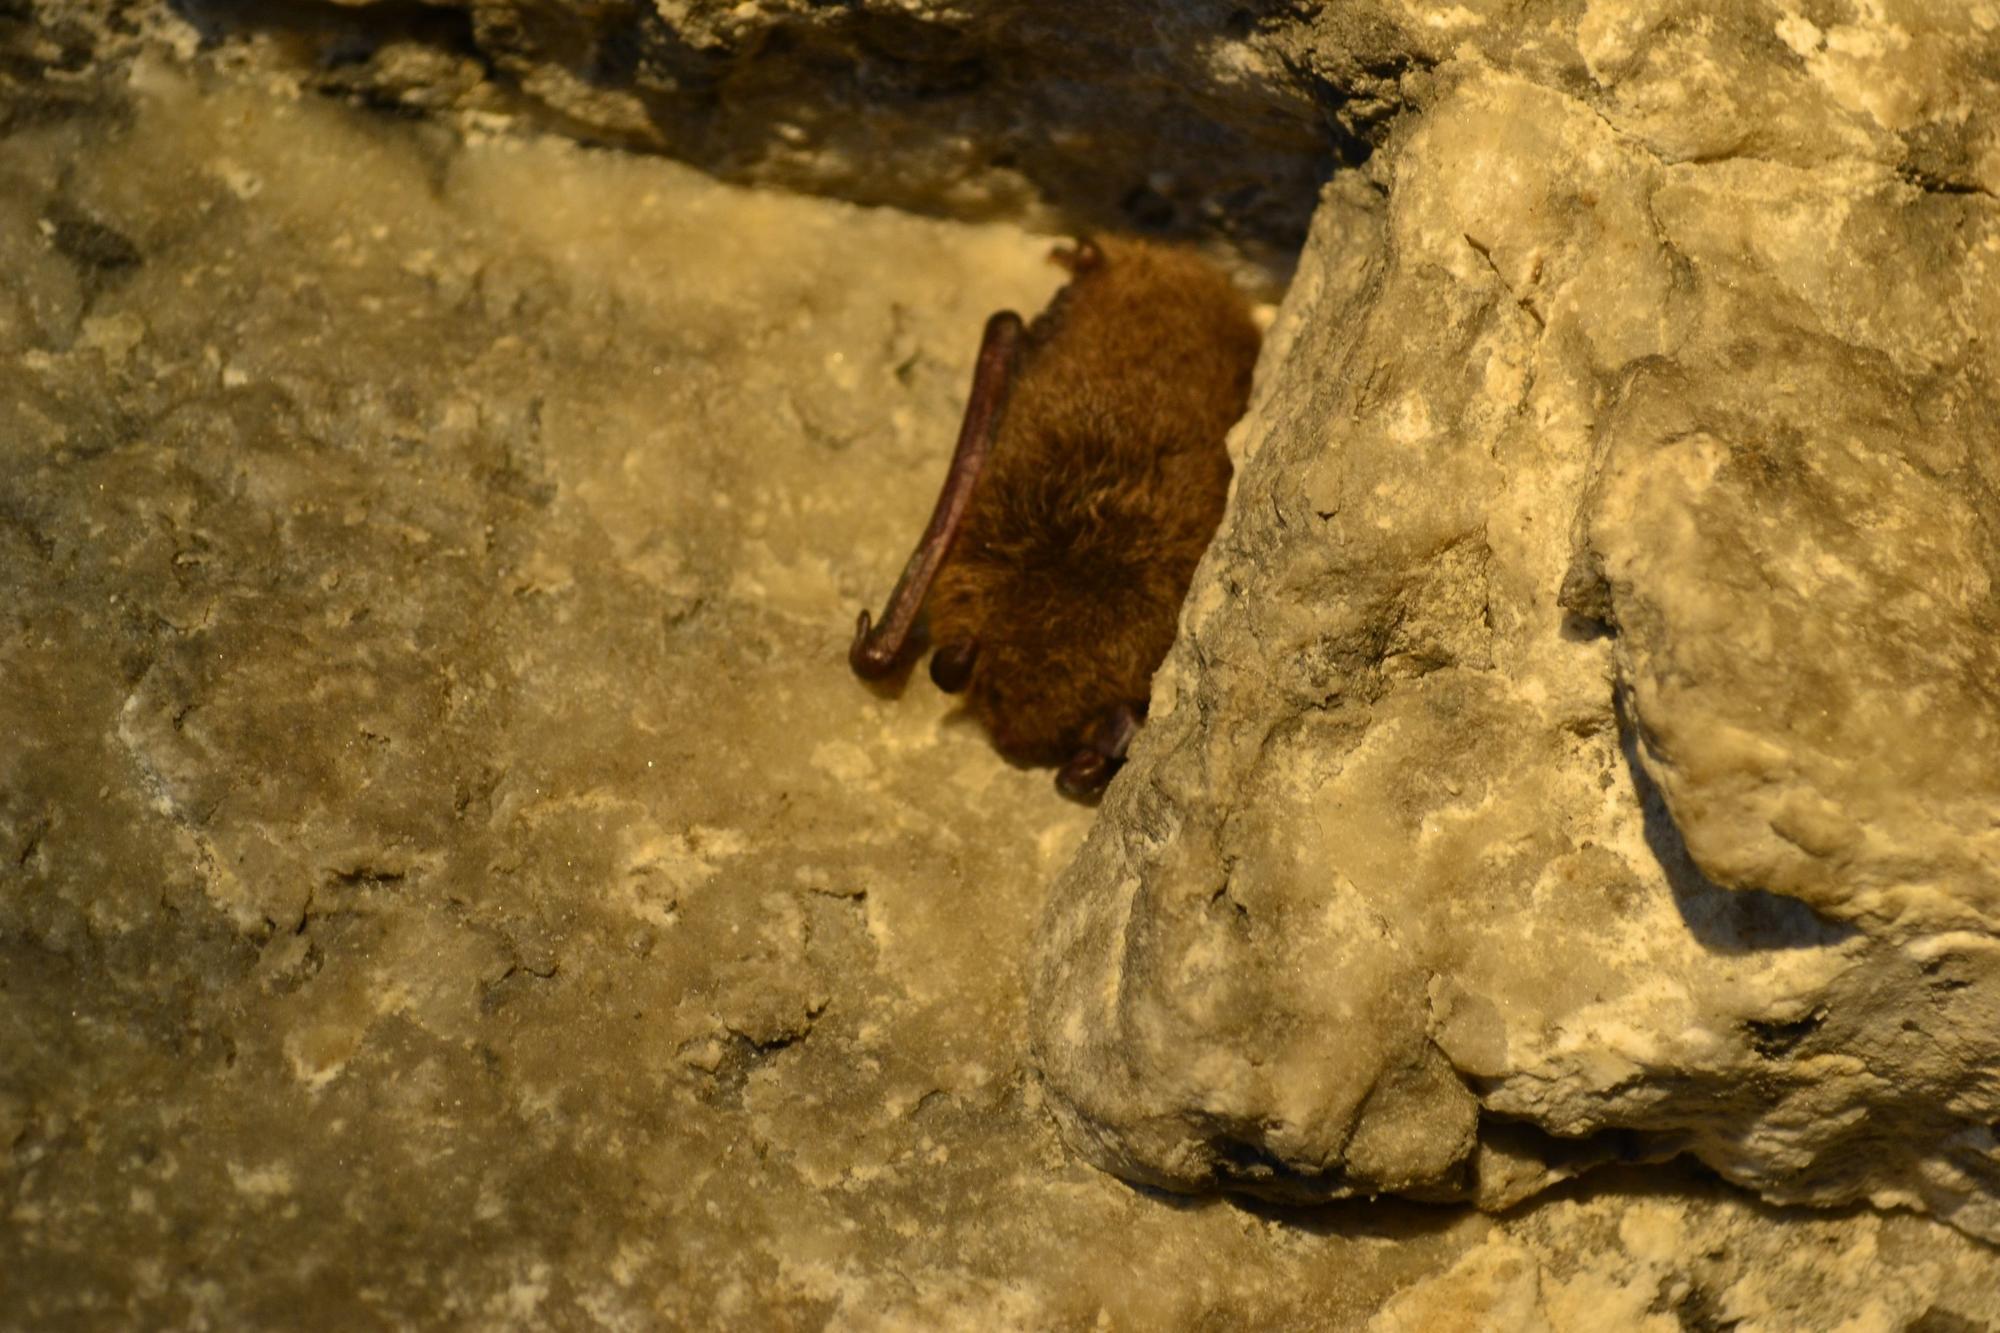 нічниця водяна кажан на Іванграді